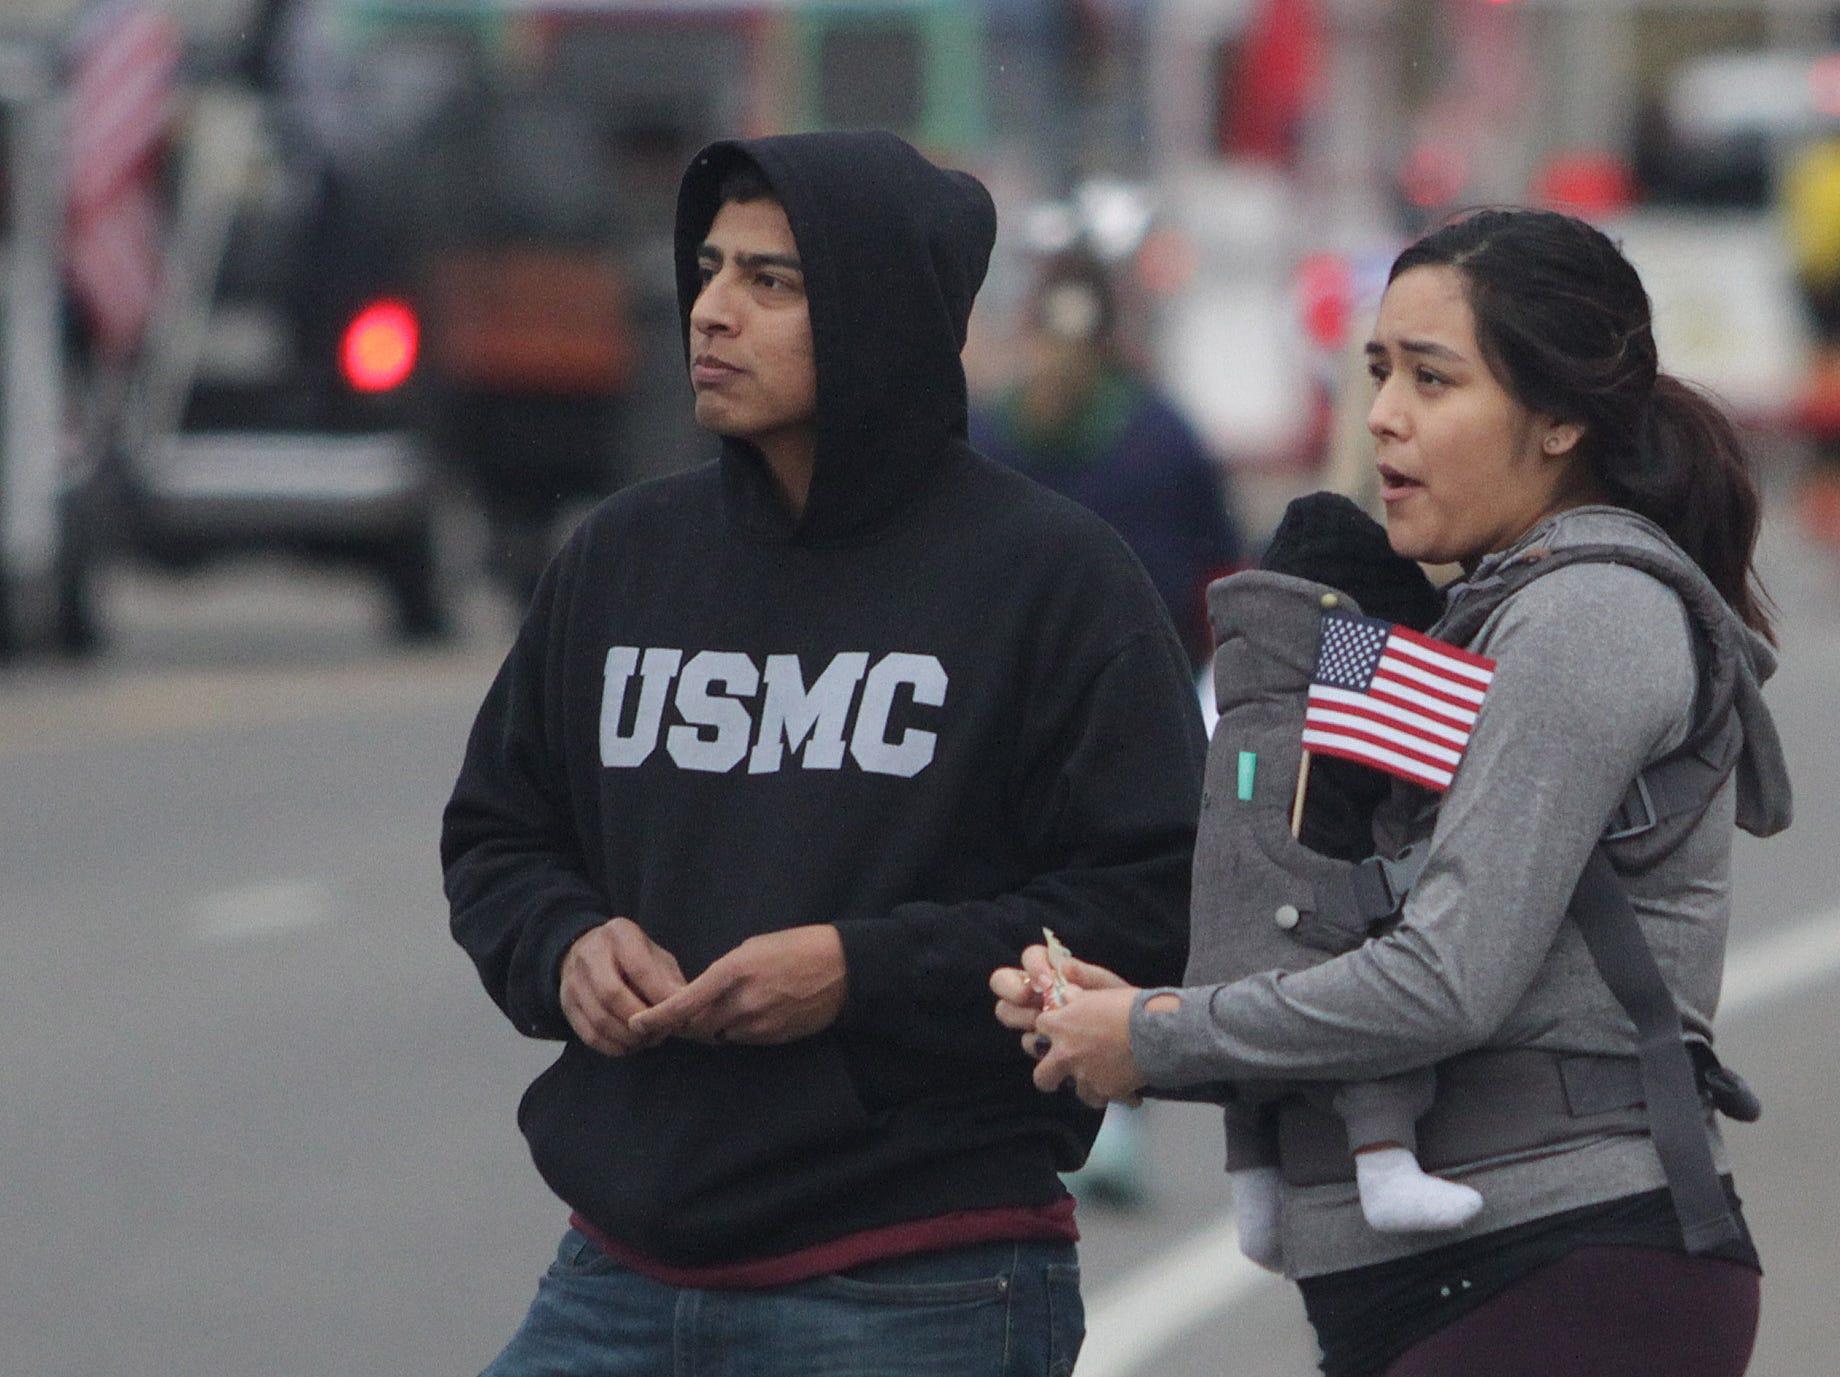 Folks watch the Veterans Day Parade in Hendersonville, TN on Sunday, November 4, 2018.